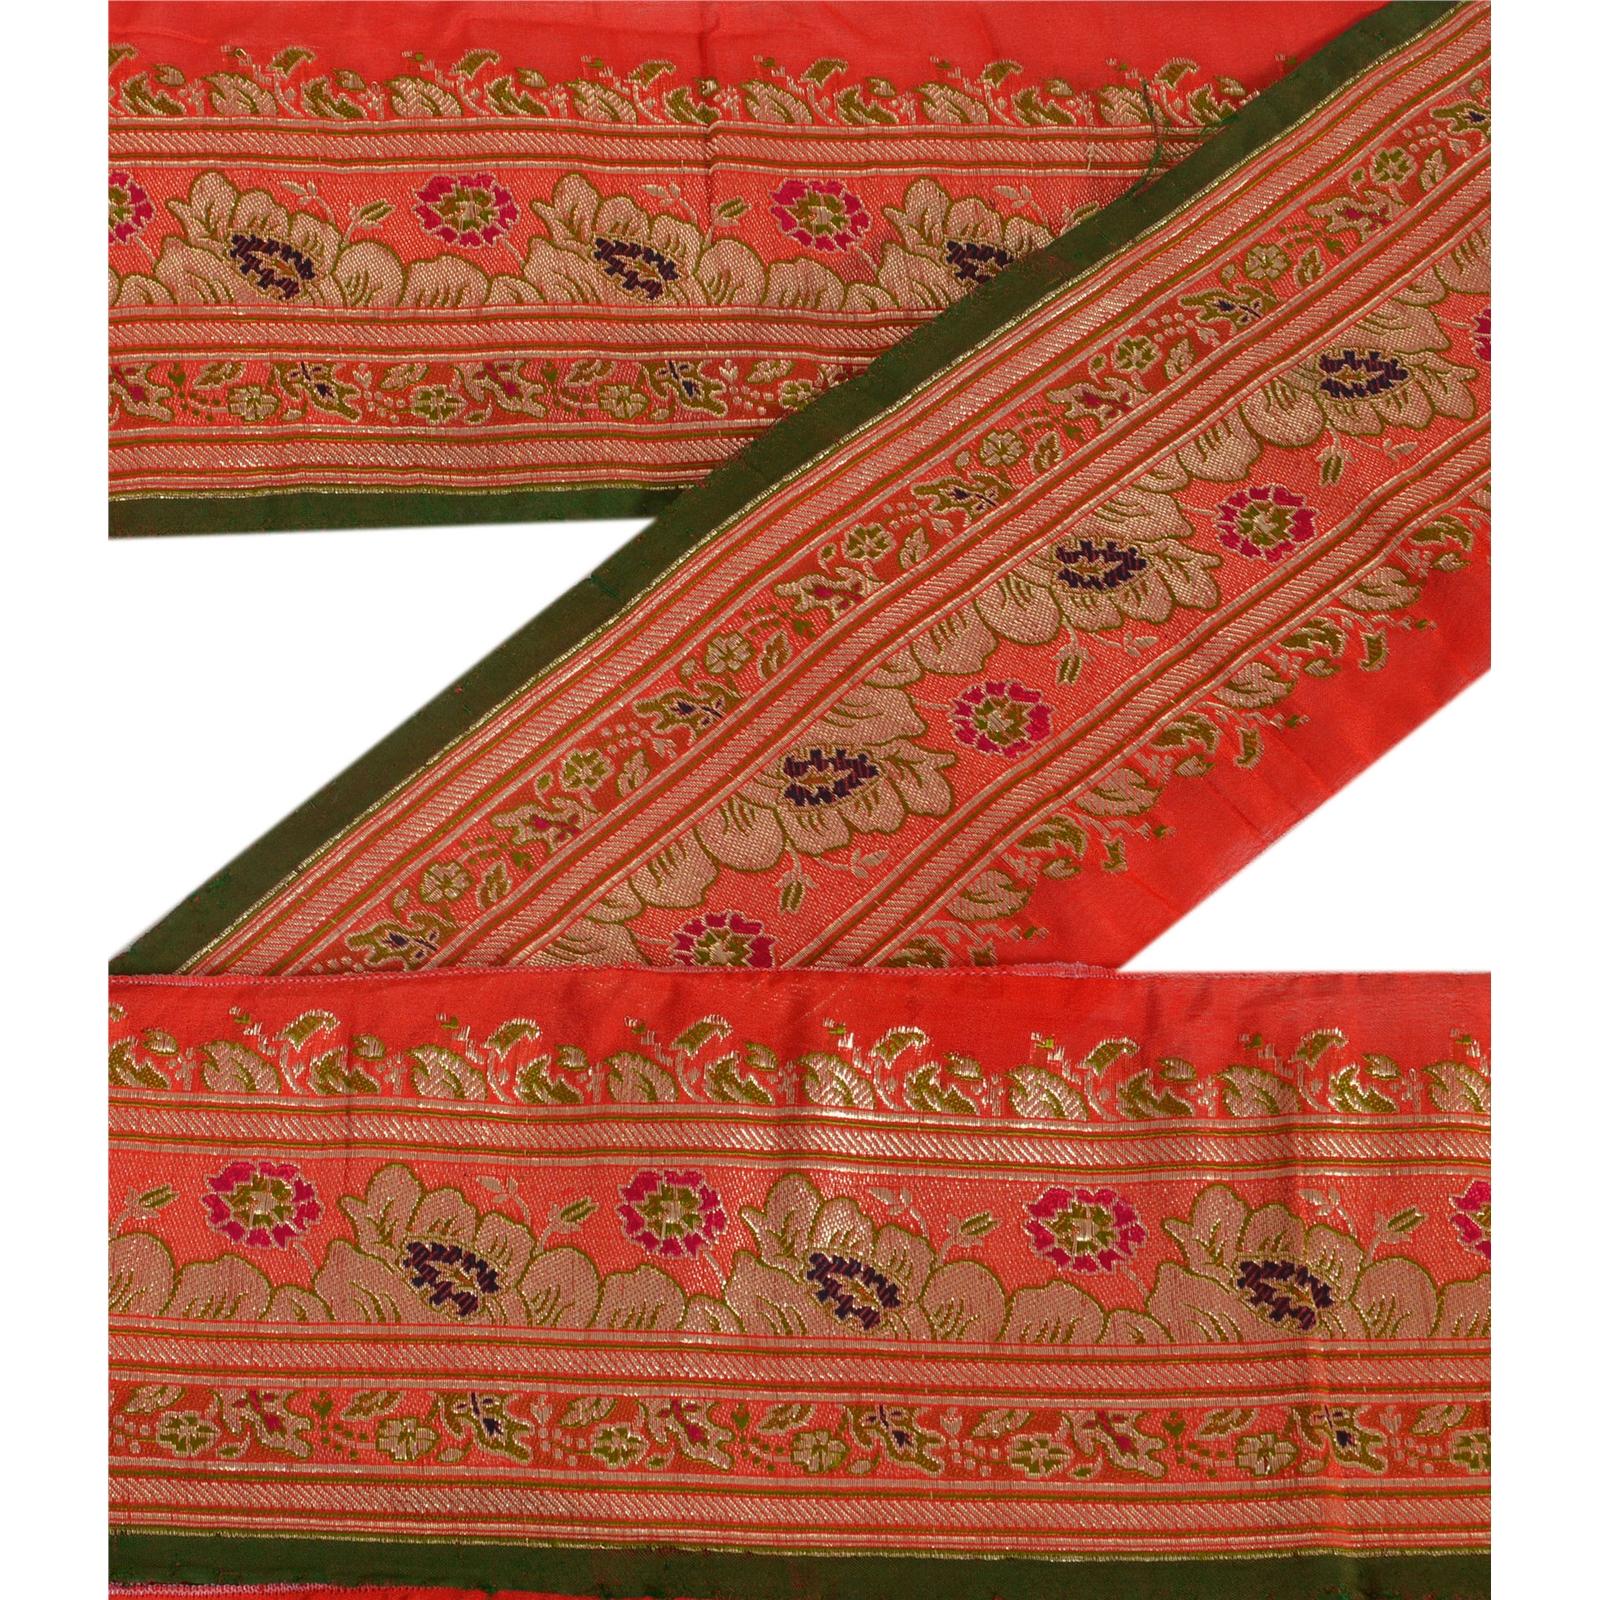 Sanskriti Vintage Sari Border Indian Craft Orange Trim Hand Beaded Ribbon Lace Crafts